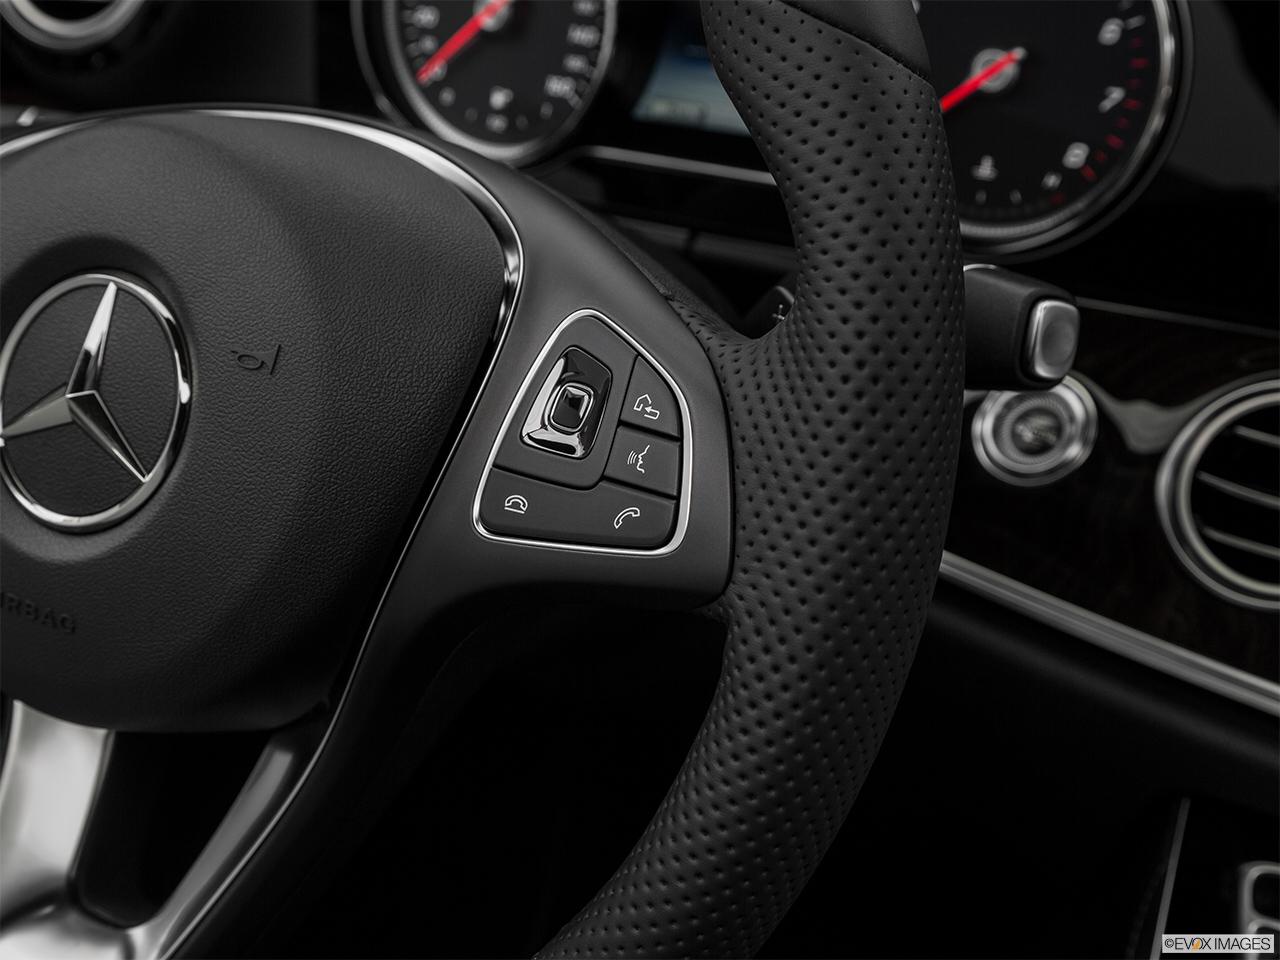 Car features list for mercedes benz e class saloon 2017 e for Mercedes benz steering wheel control buttons